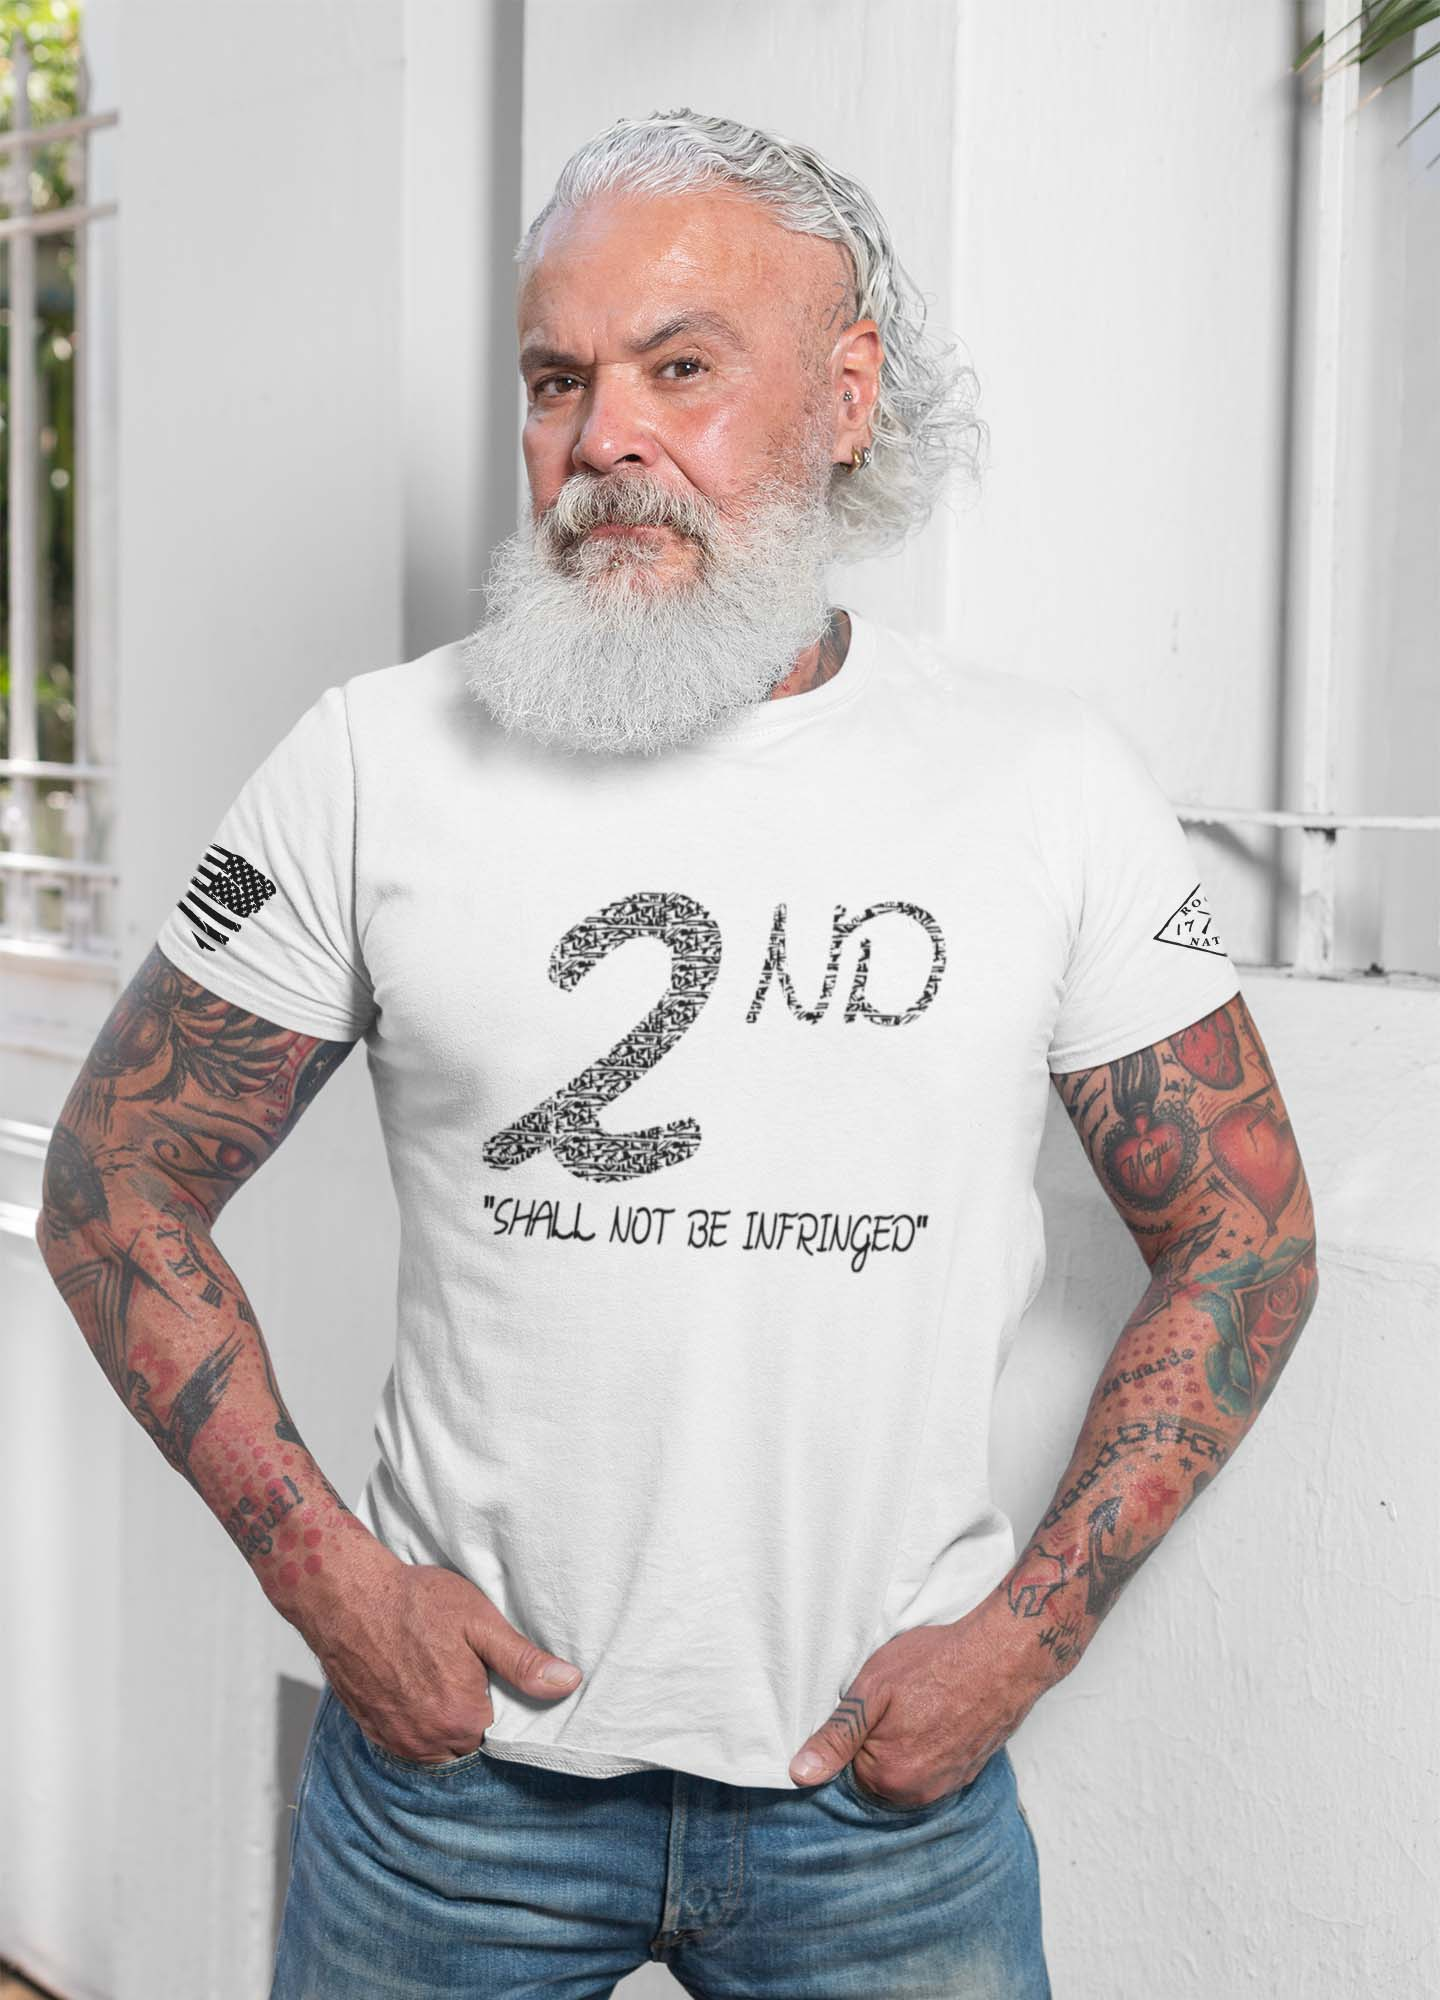 t-shirt shall not be infringed on white mens